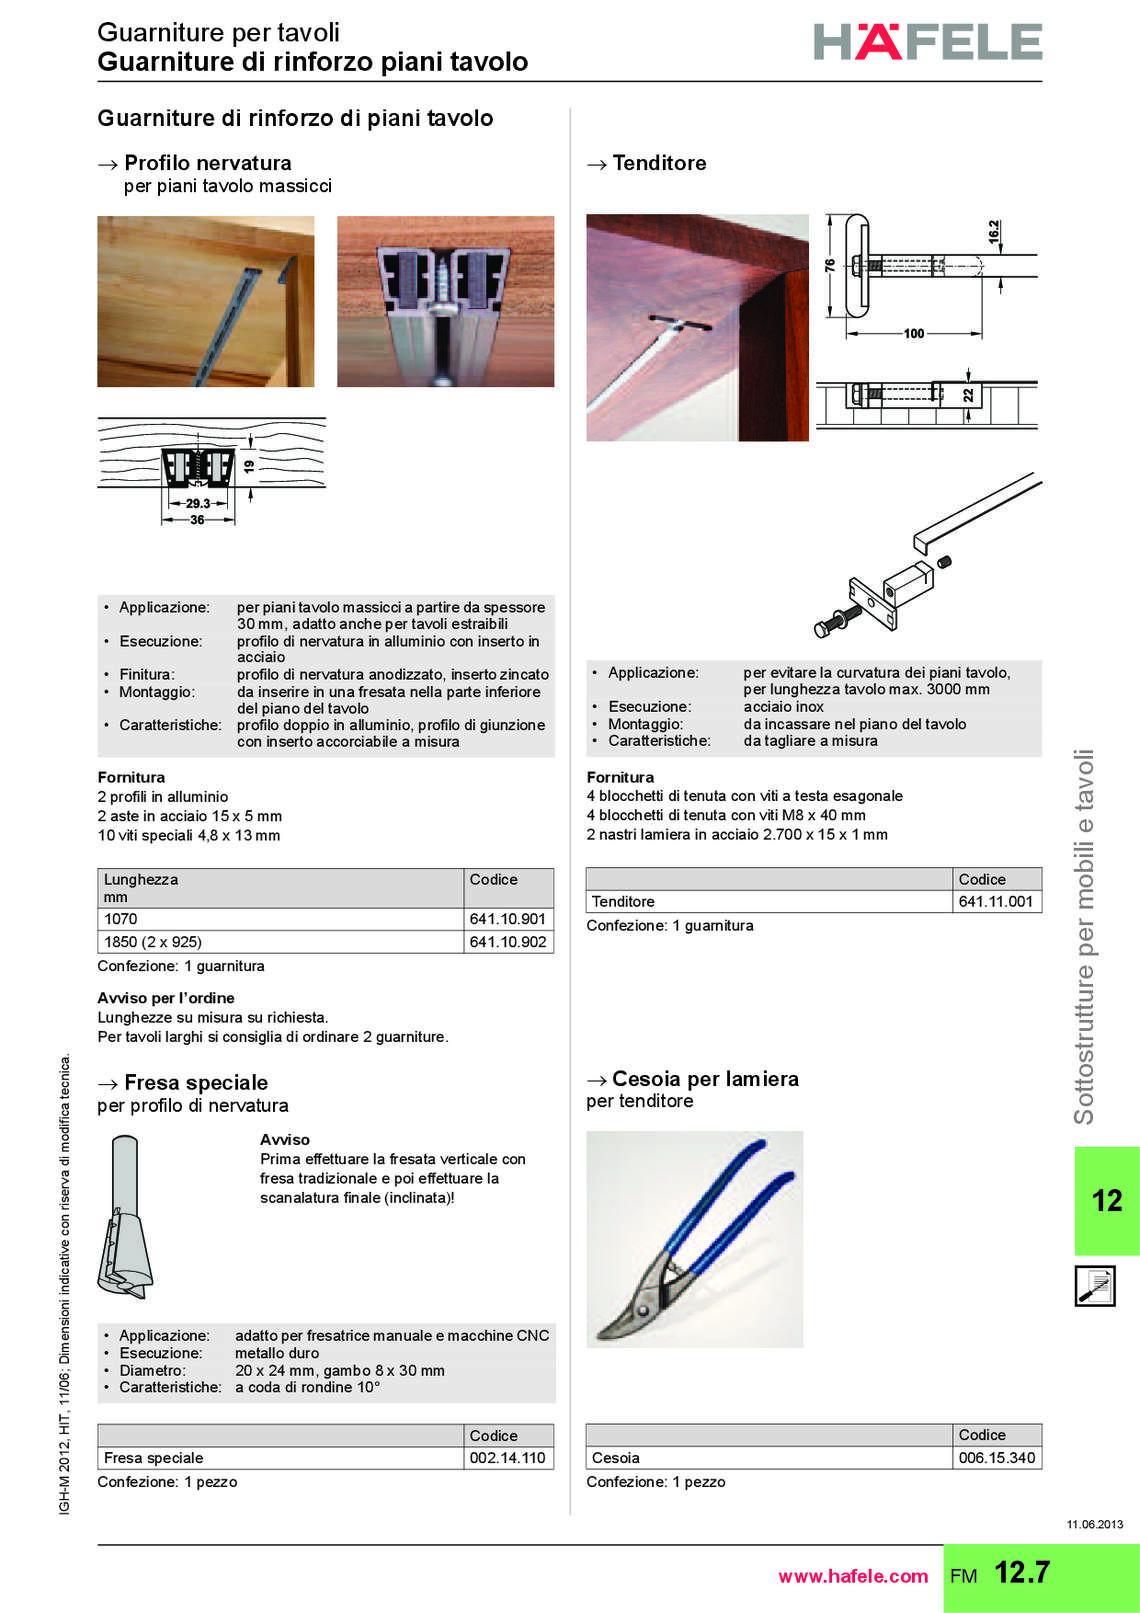 hafele-sottostrutture-per-mobili_83_016.jpg